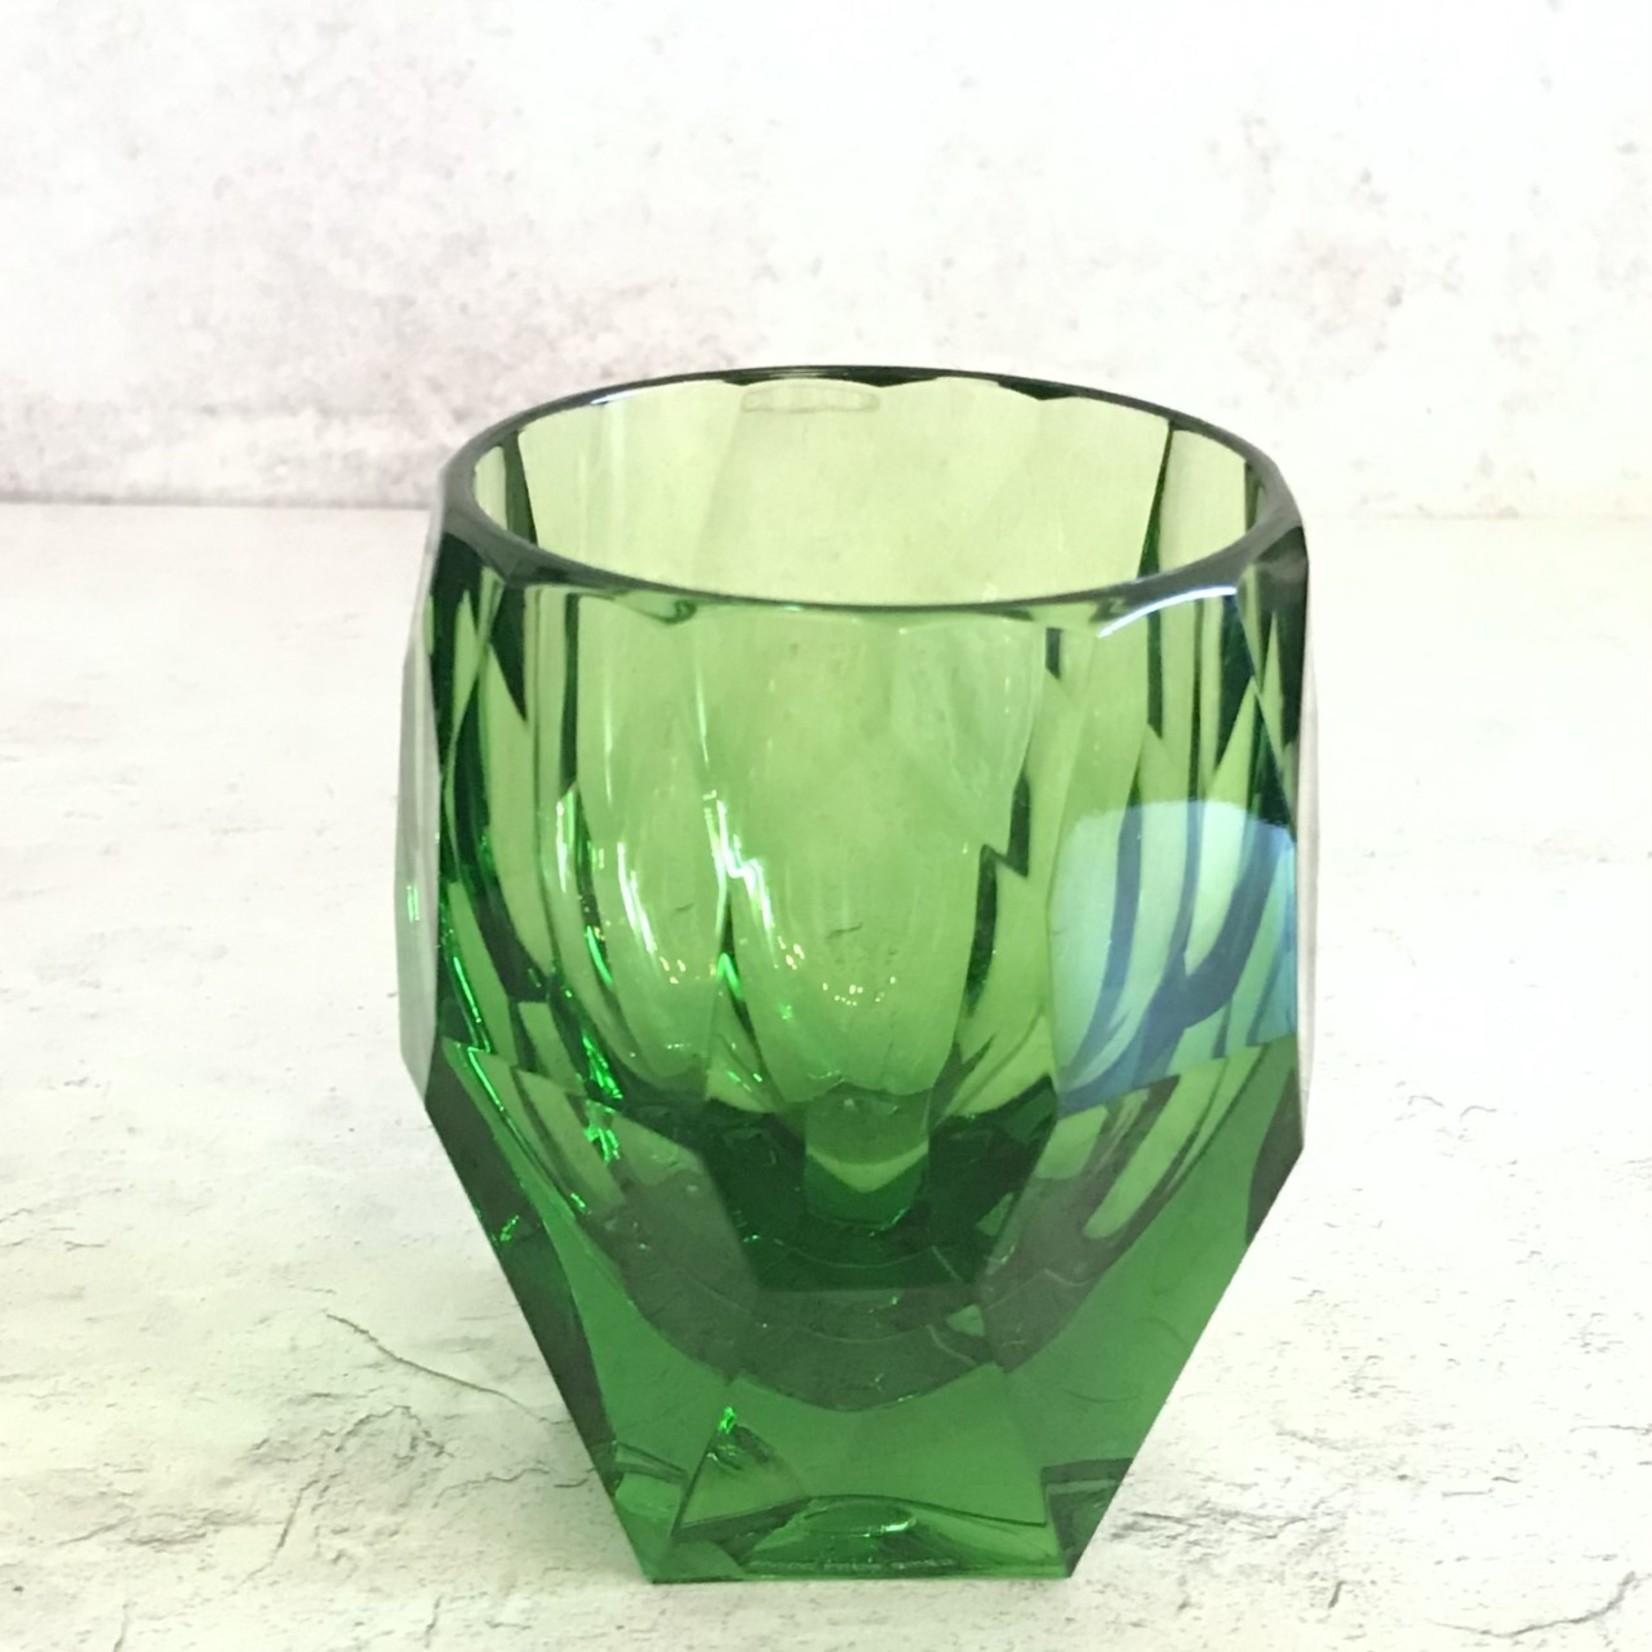 Marioluca Giusti Marioluca Giusti- Milly Tumbler-Green